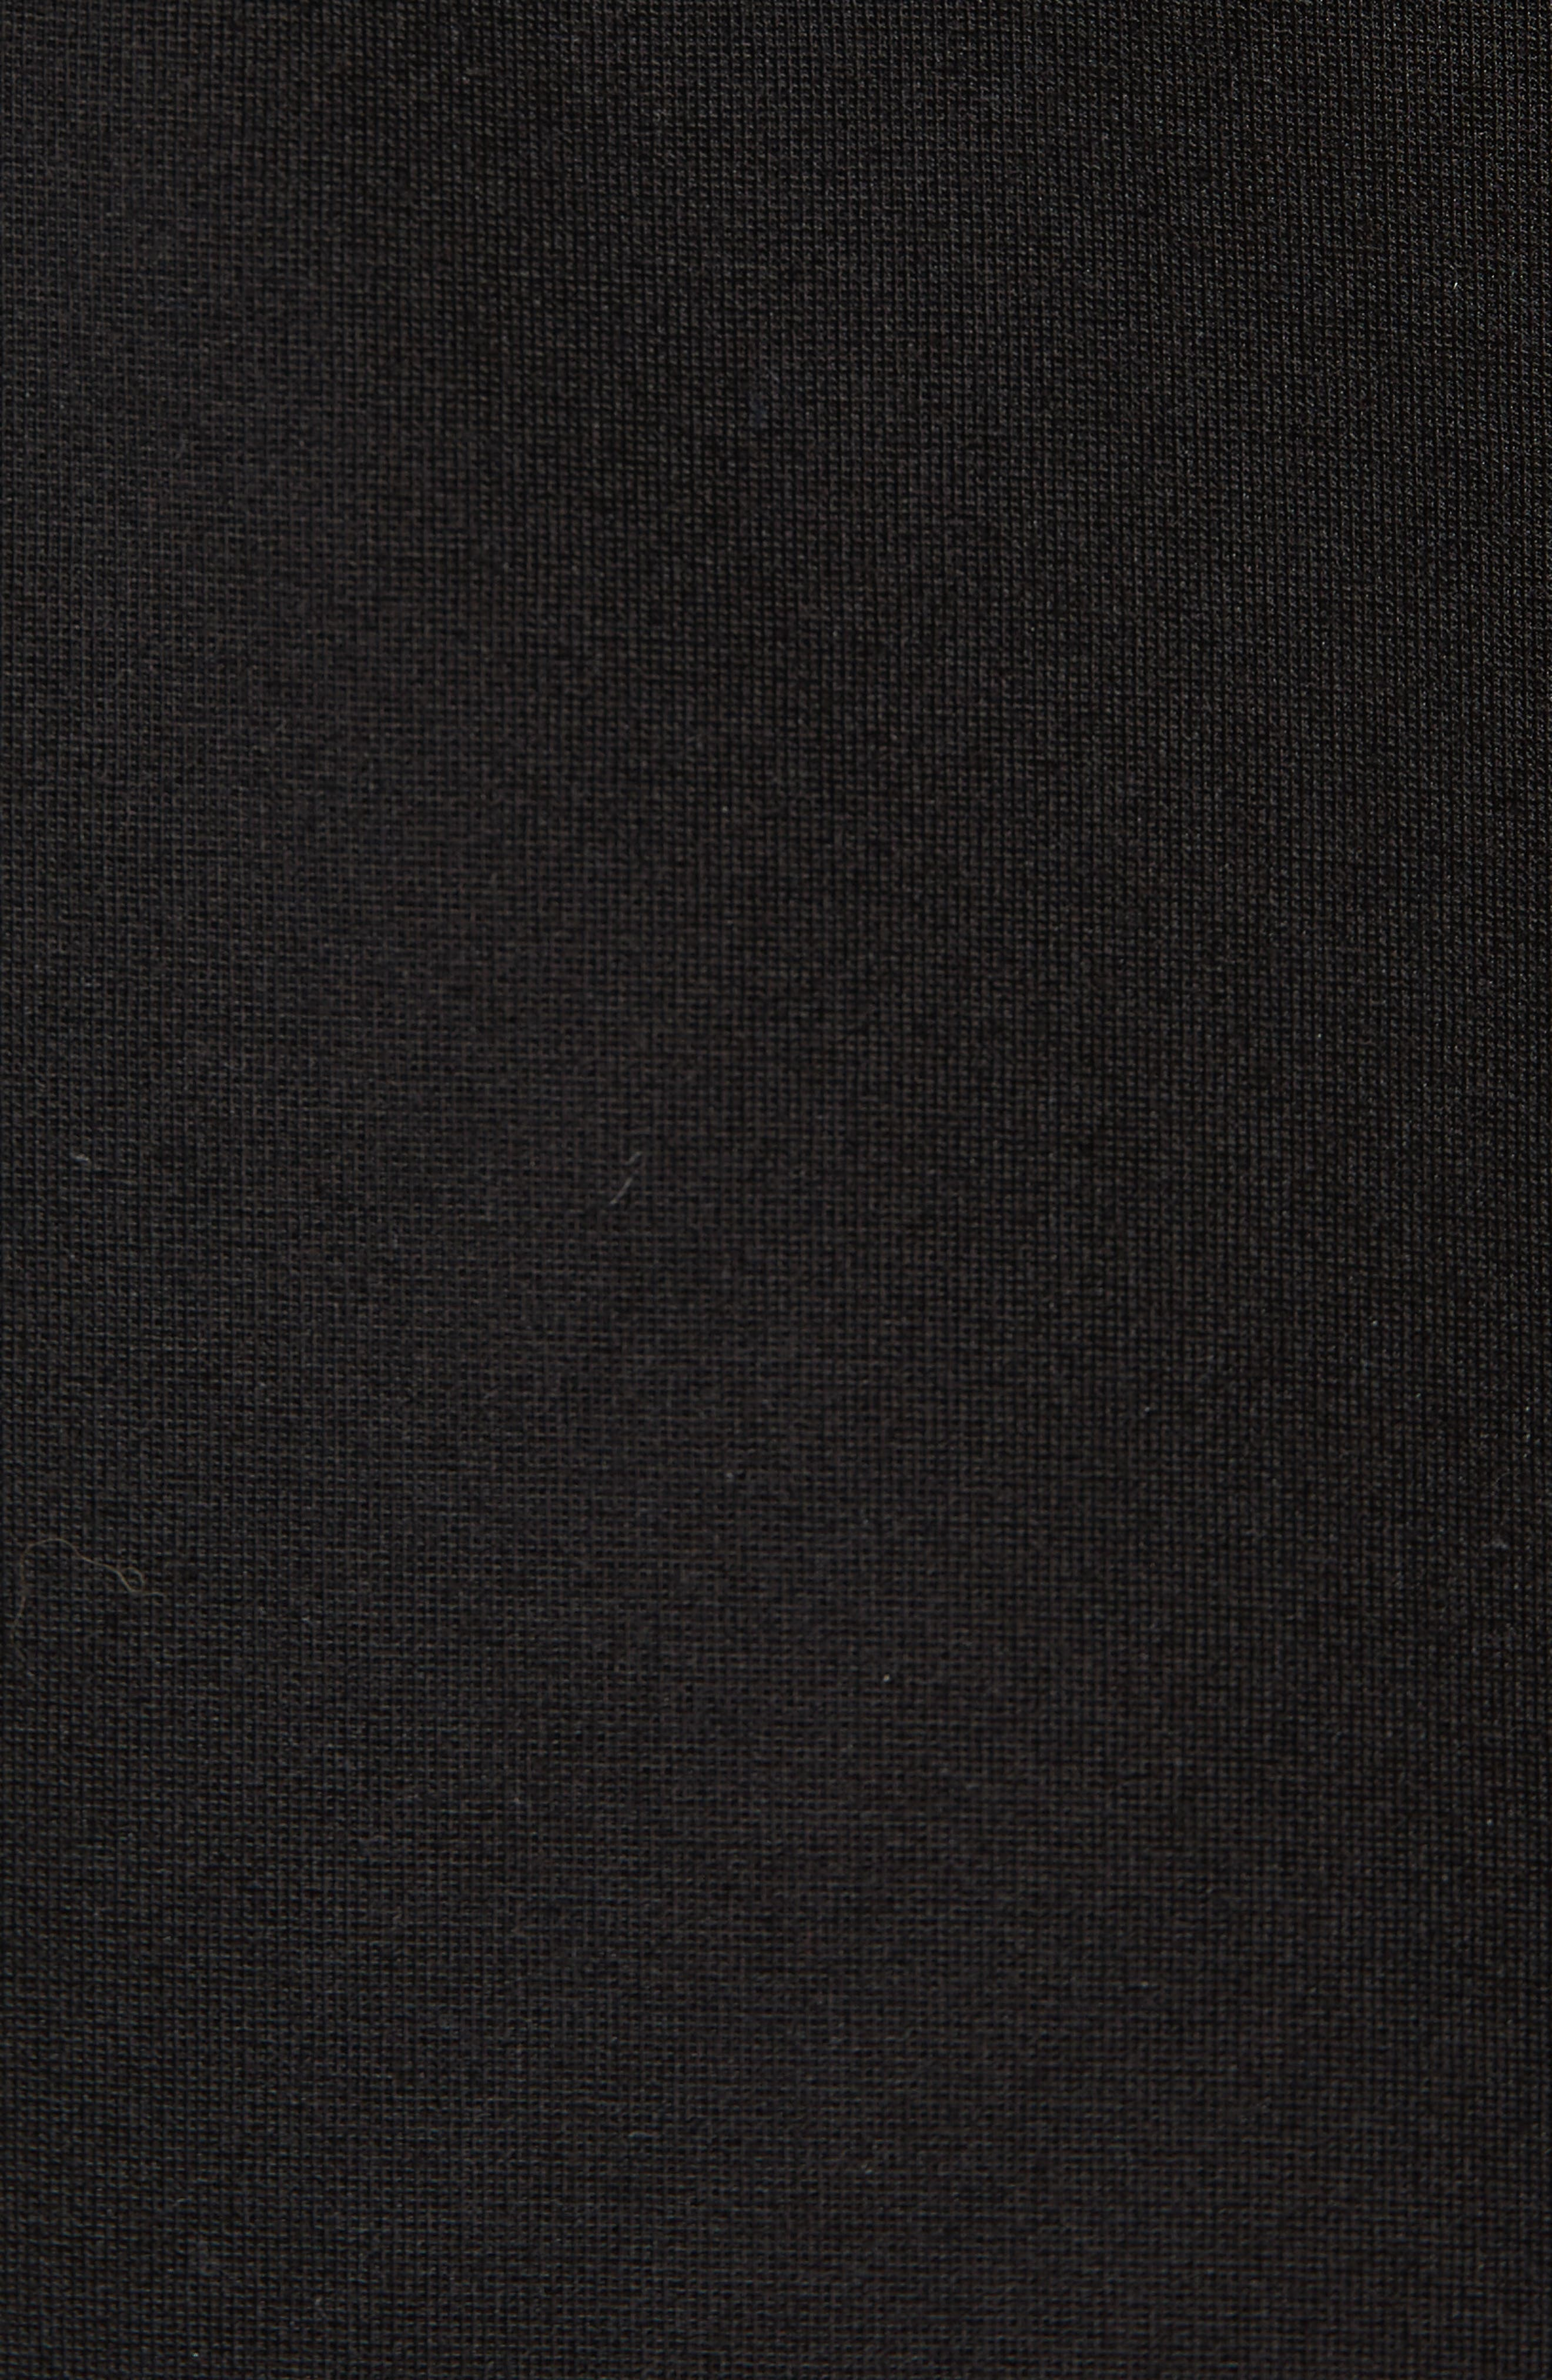 Ponte Knit Pencil Skirt,                             Alternate thumbnail 5, color,                             001